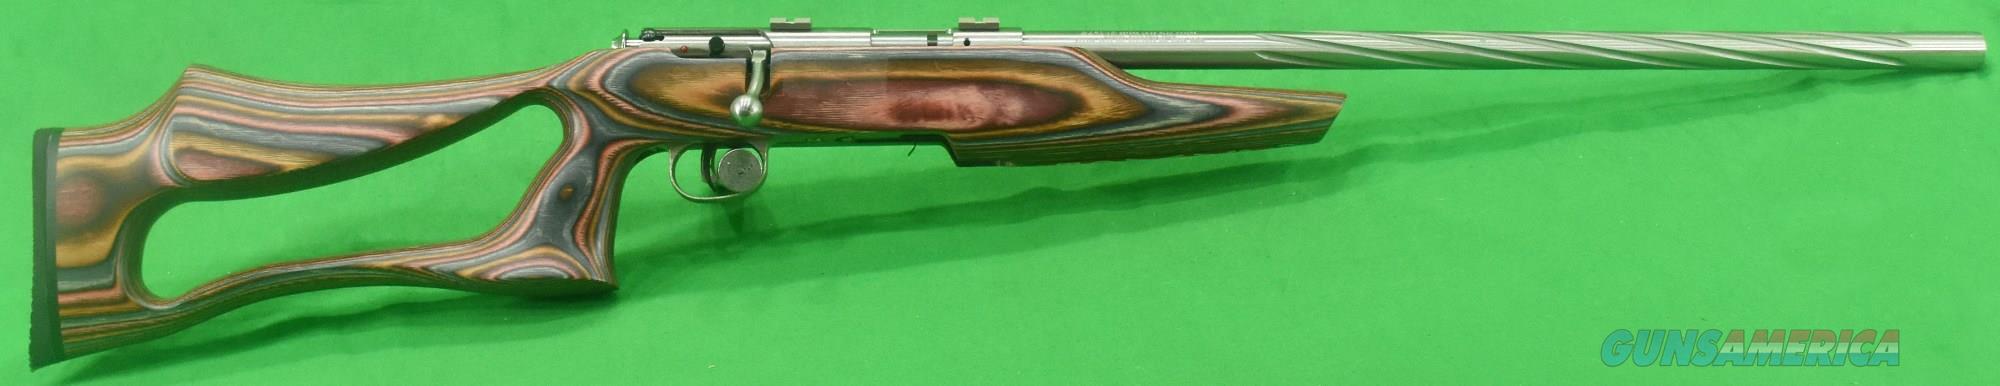 Mark II BSEV Lam Evolution SS 22 LR 21In  25740  Guns > Rifles > Savage Rifles